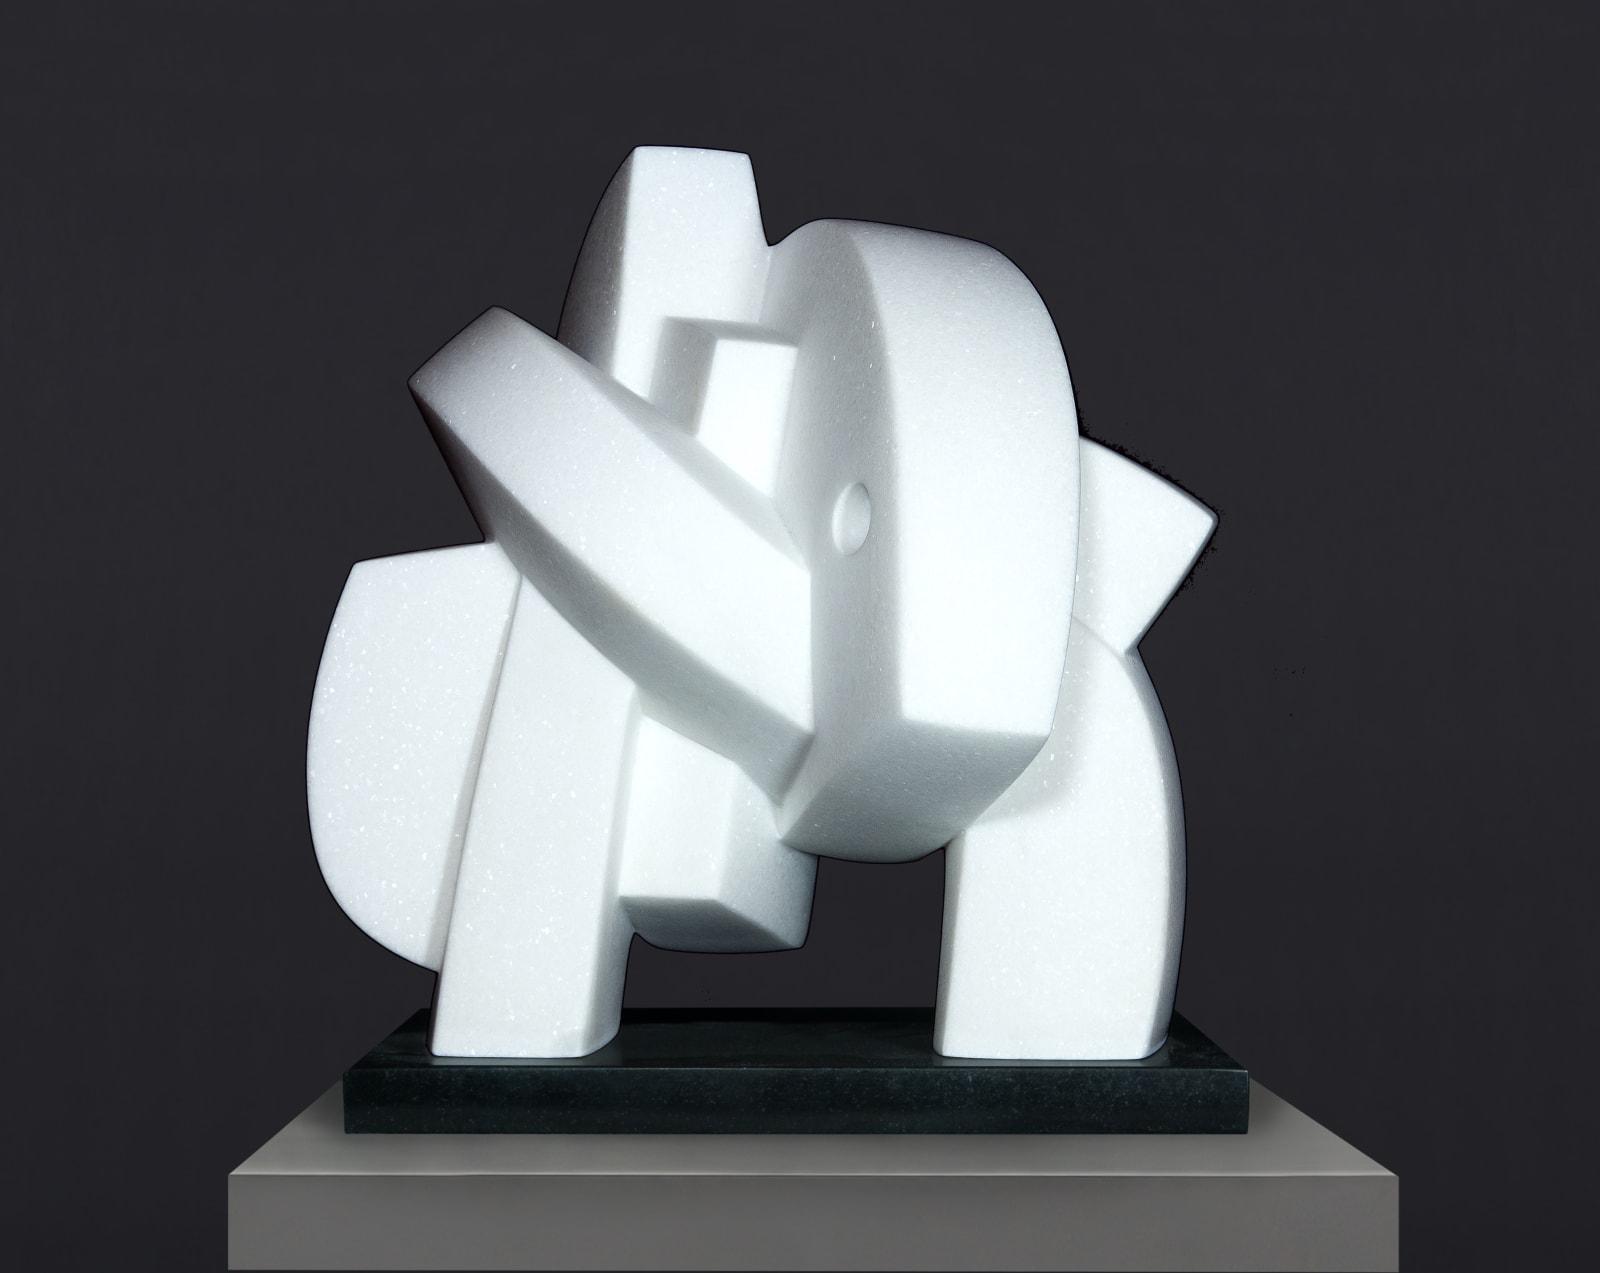 Sophia Vari, Naissance sculpture, 2015